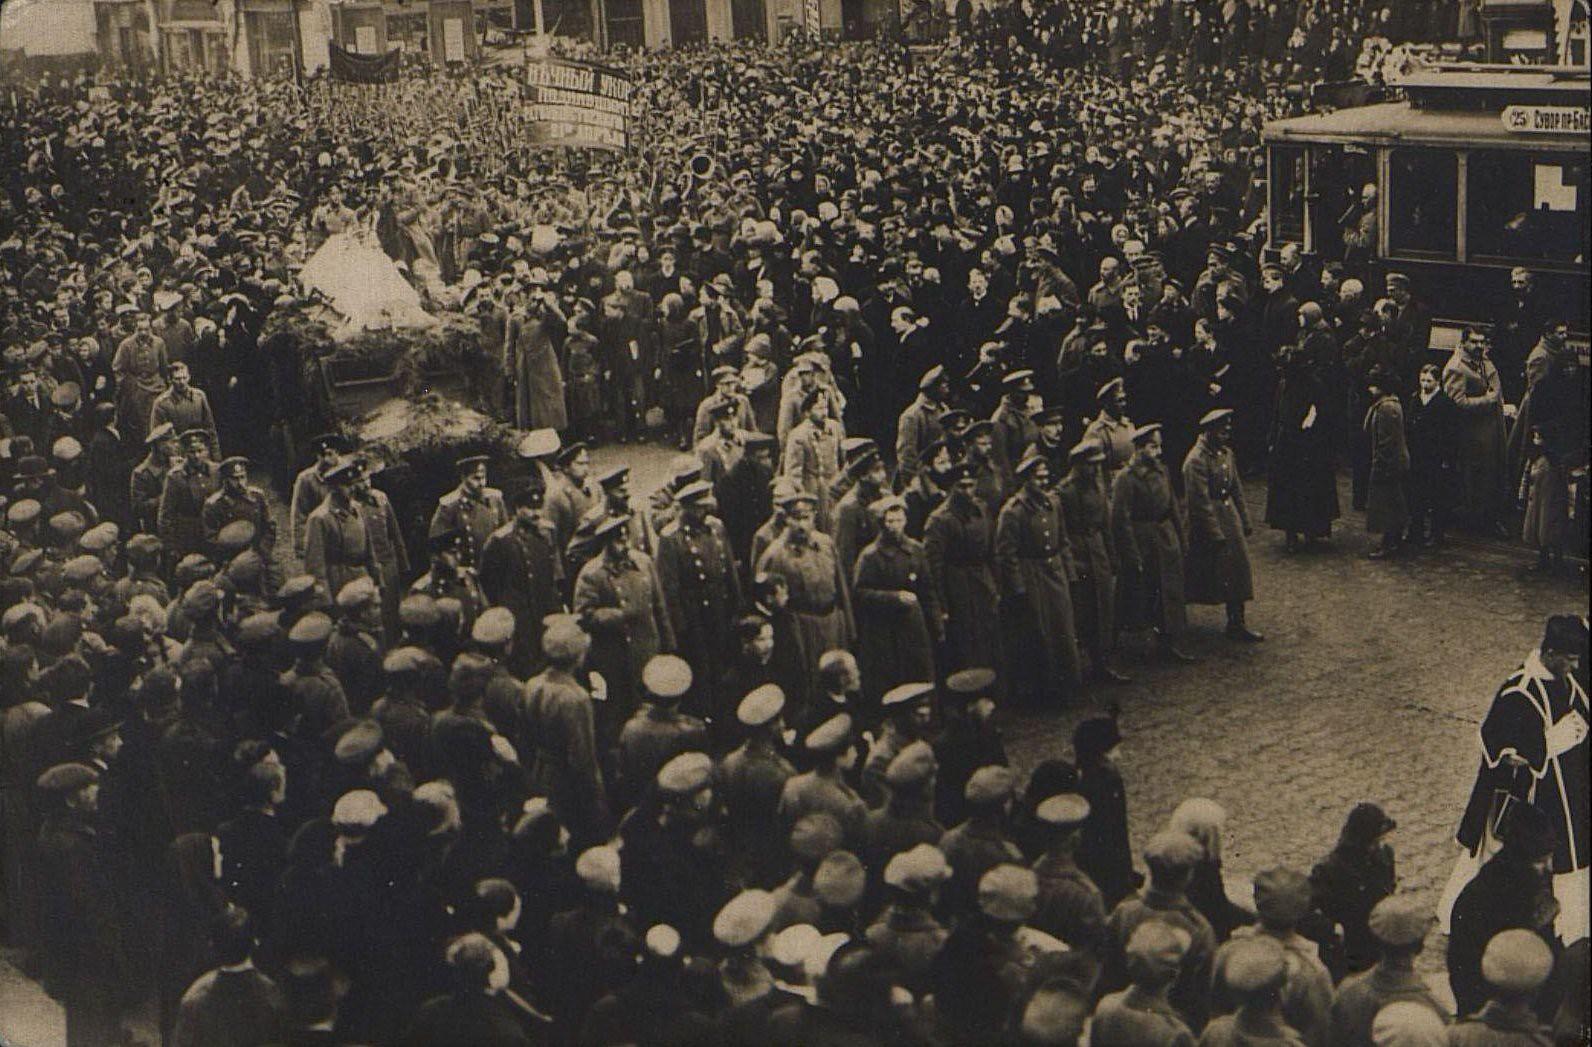 23 марта. Похороны жертв революции. Петроград